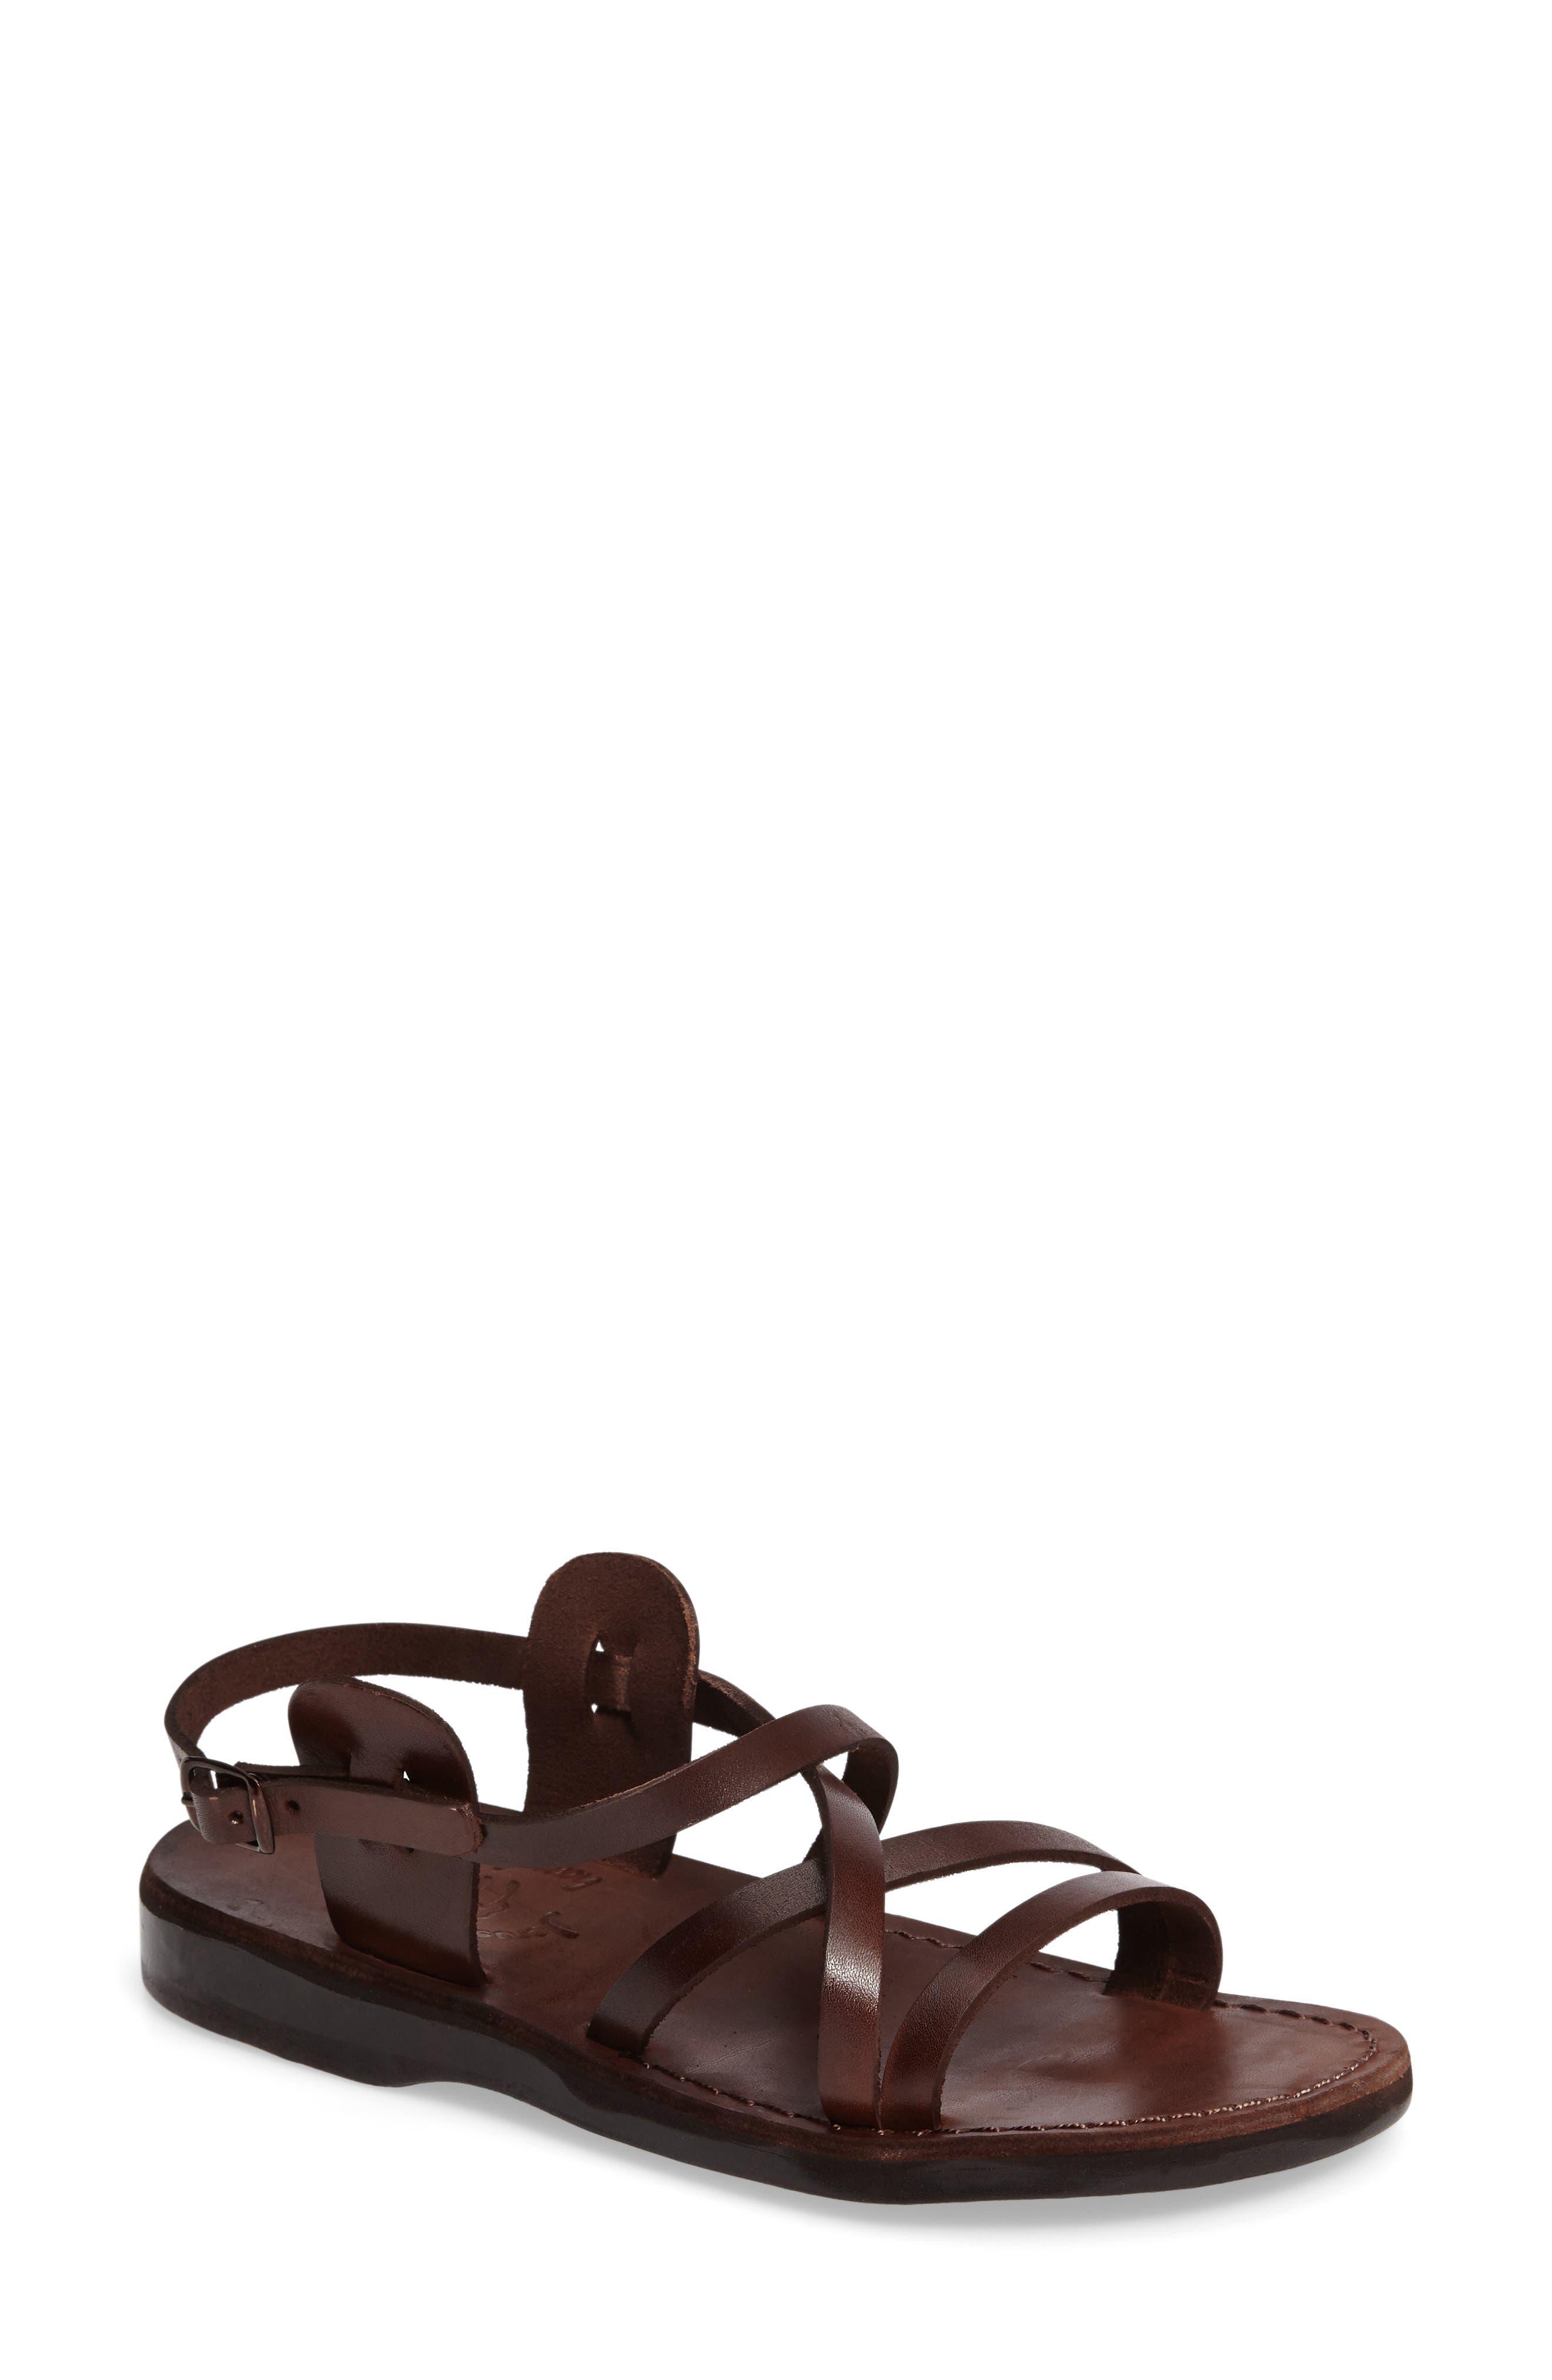 Main Image - Jerusalem Sandals Tzippora Slingback Sandal (Women)